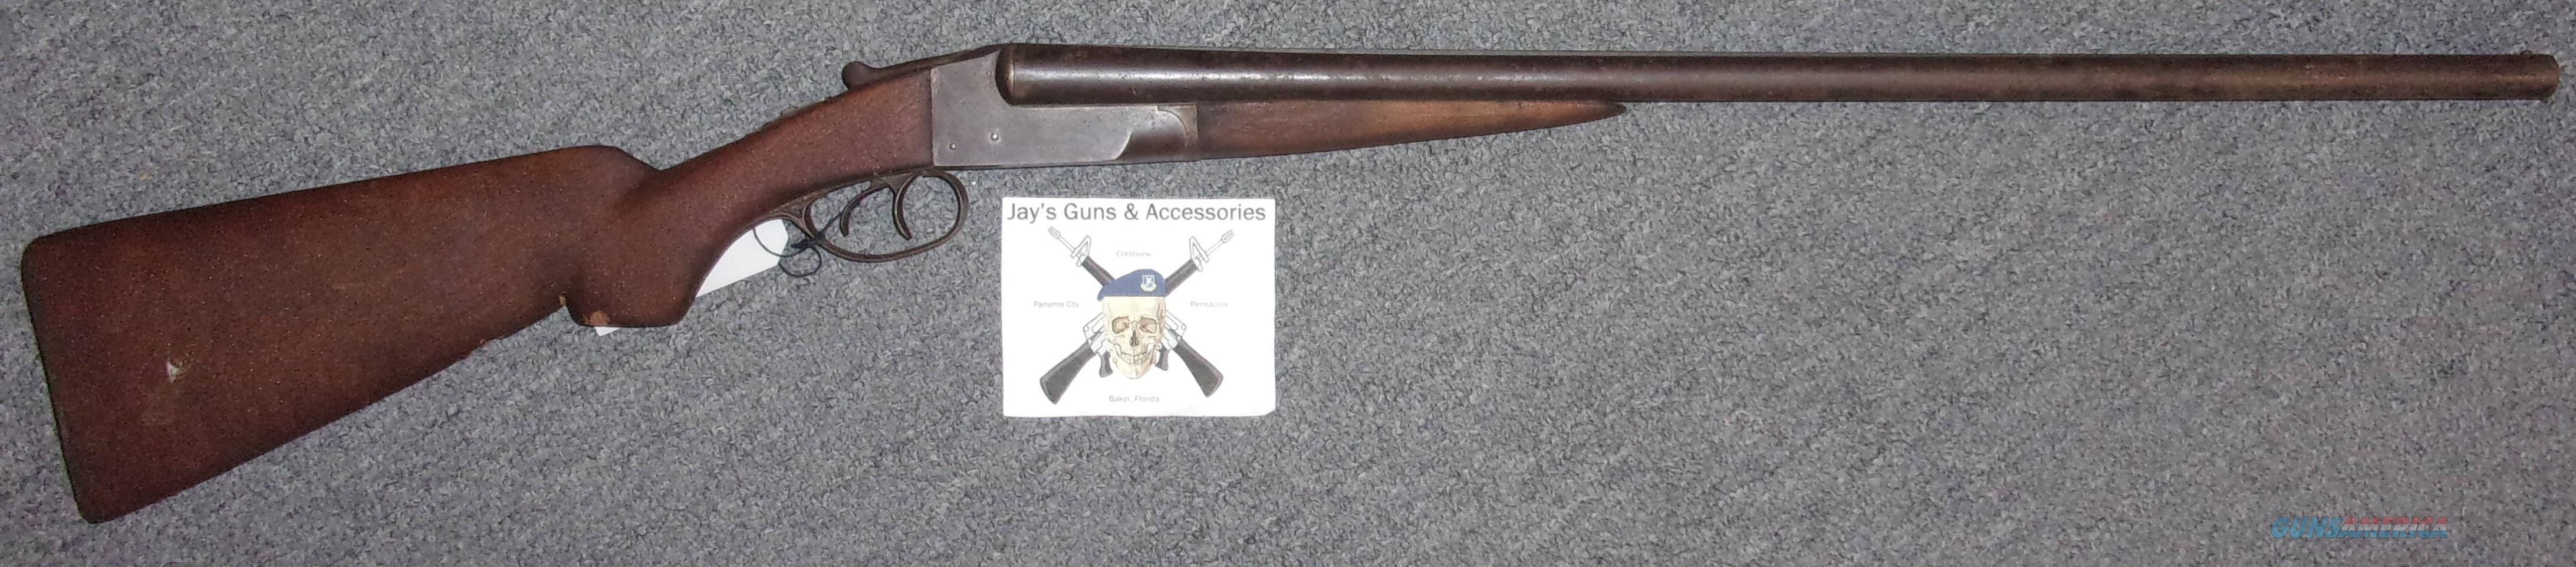 Ithaca Gun Company Hammerless  Guns > Shotguns > Ithaca Shotguns > SxS